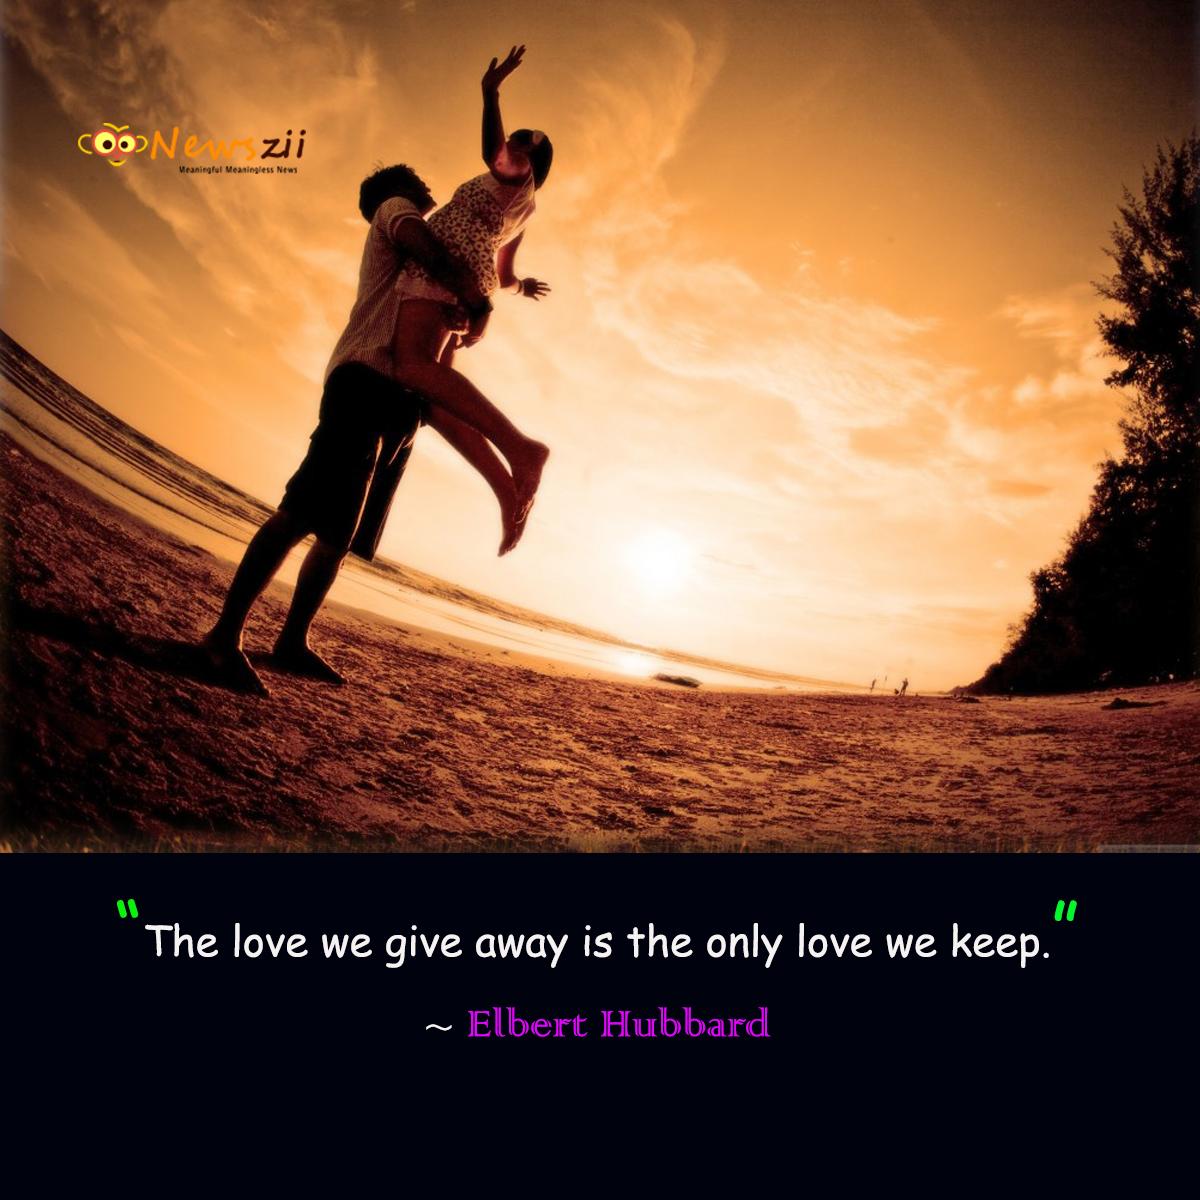 valentines-day-romantic-love-quotes-v102